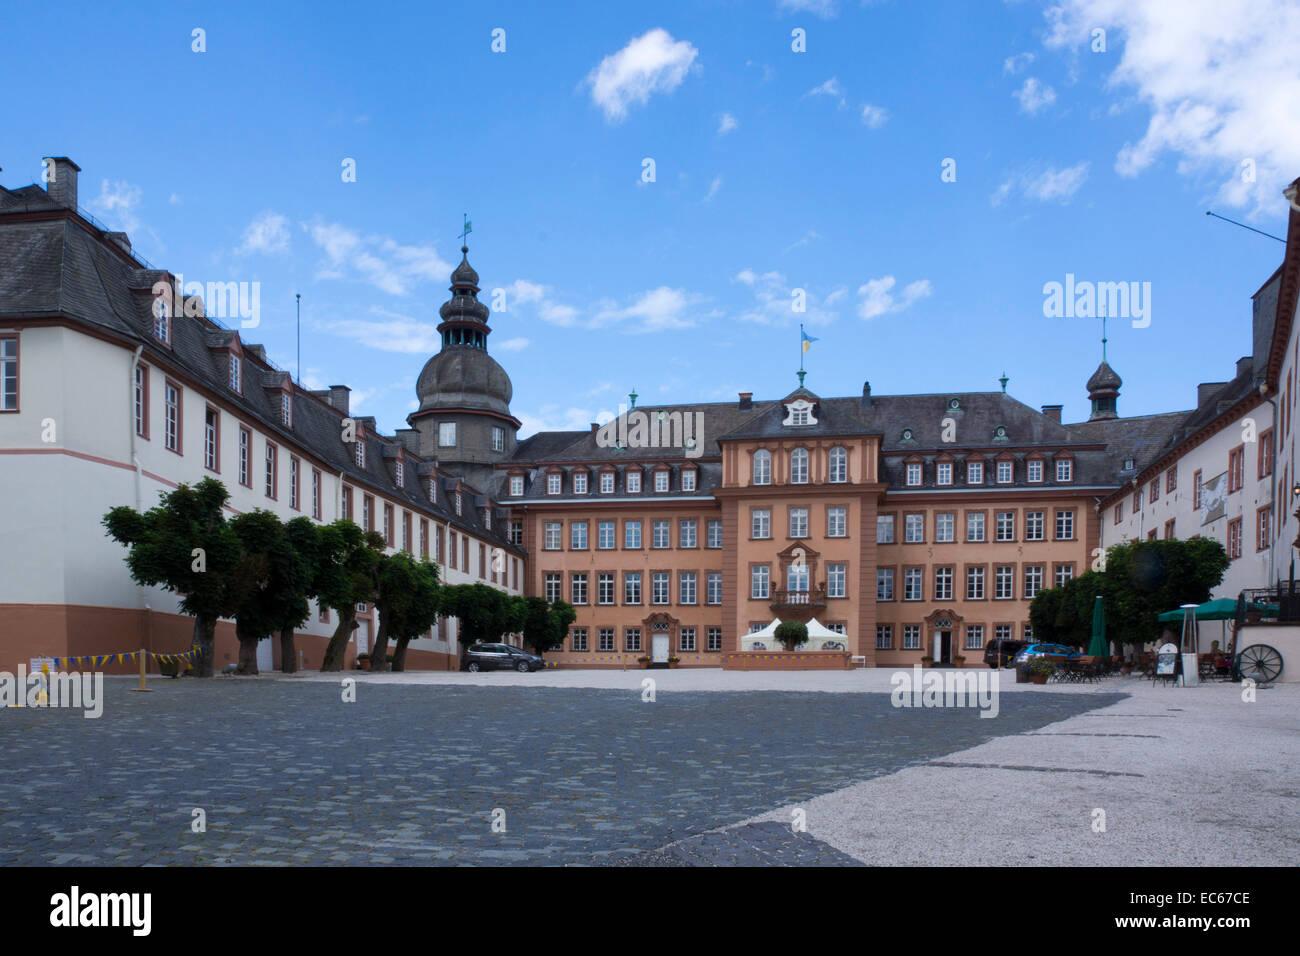 Schloss Berleburg Schloss, Bad Berleburg, Kreis Siegen-Wittgenstein ...